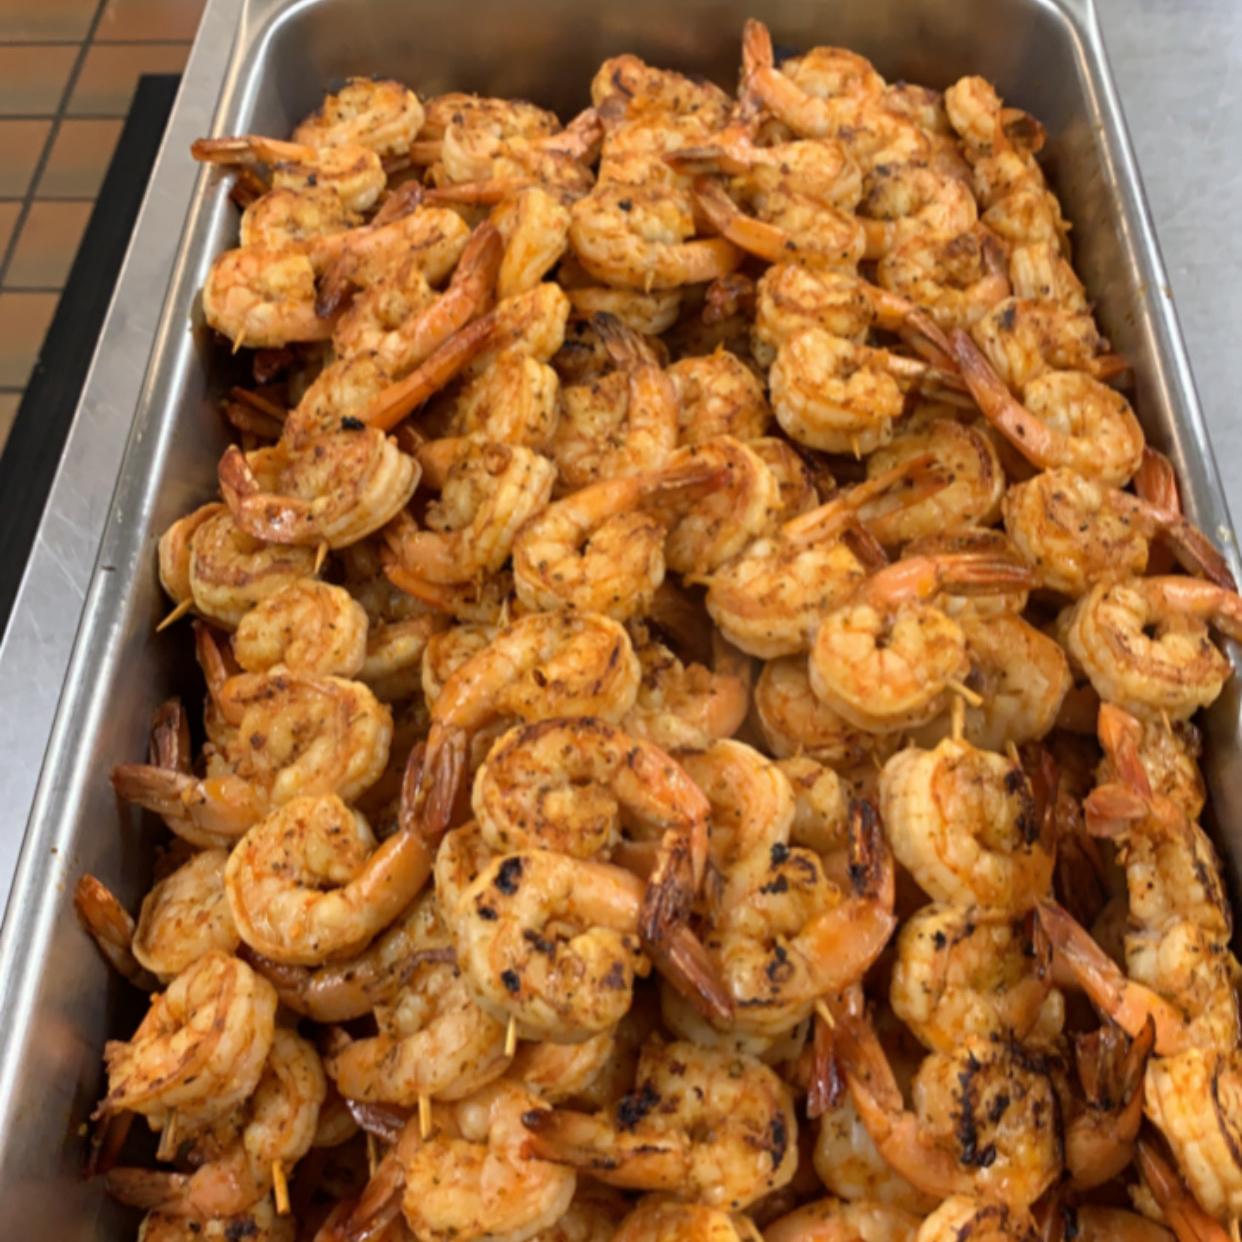 Grilled Garlic and Herb Shrimp